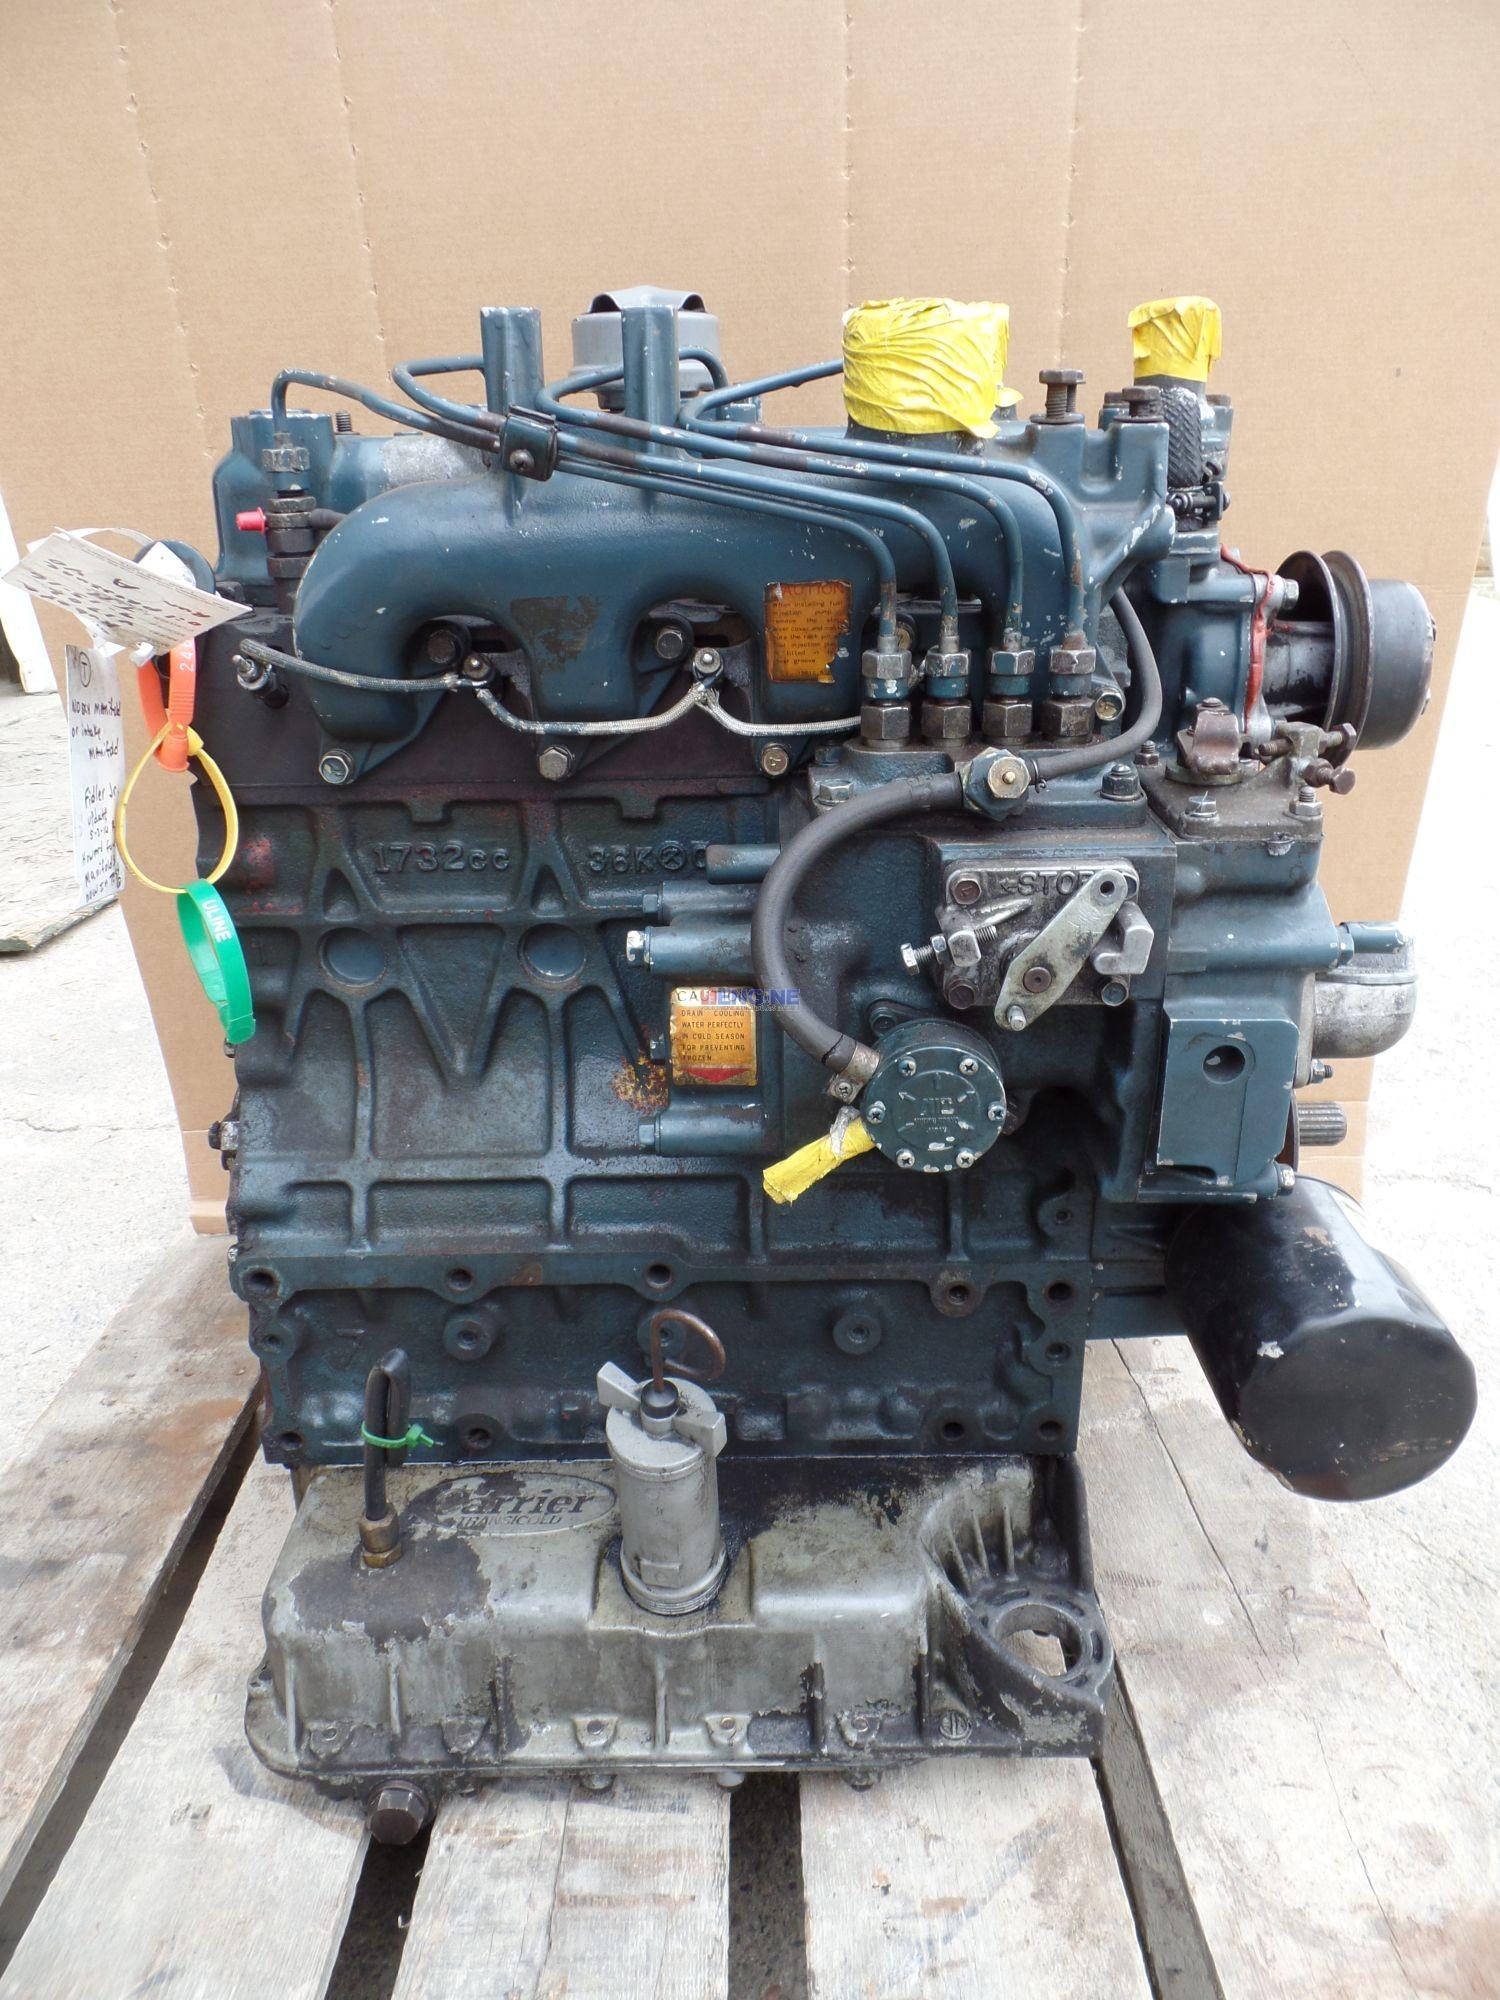 Kubota V1702 I D I , 1 7L Engine Complete